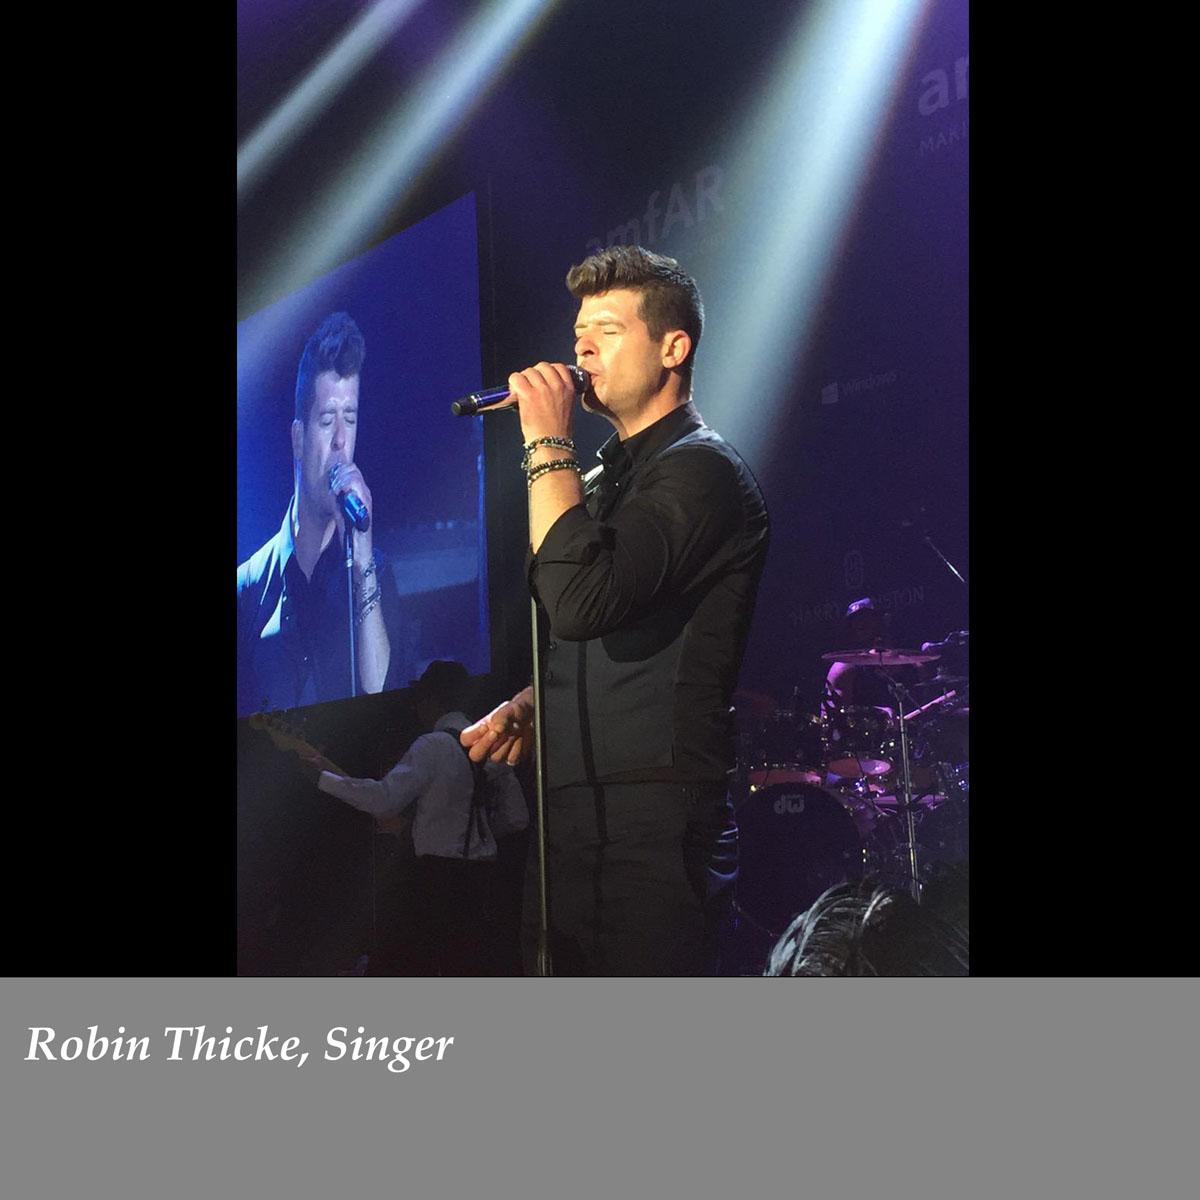 Robin-Thicke-Singer